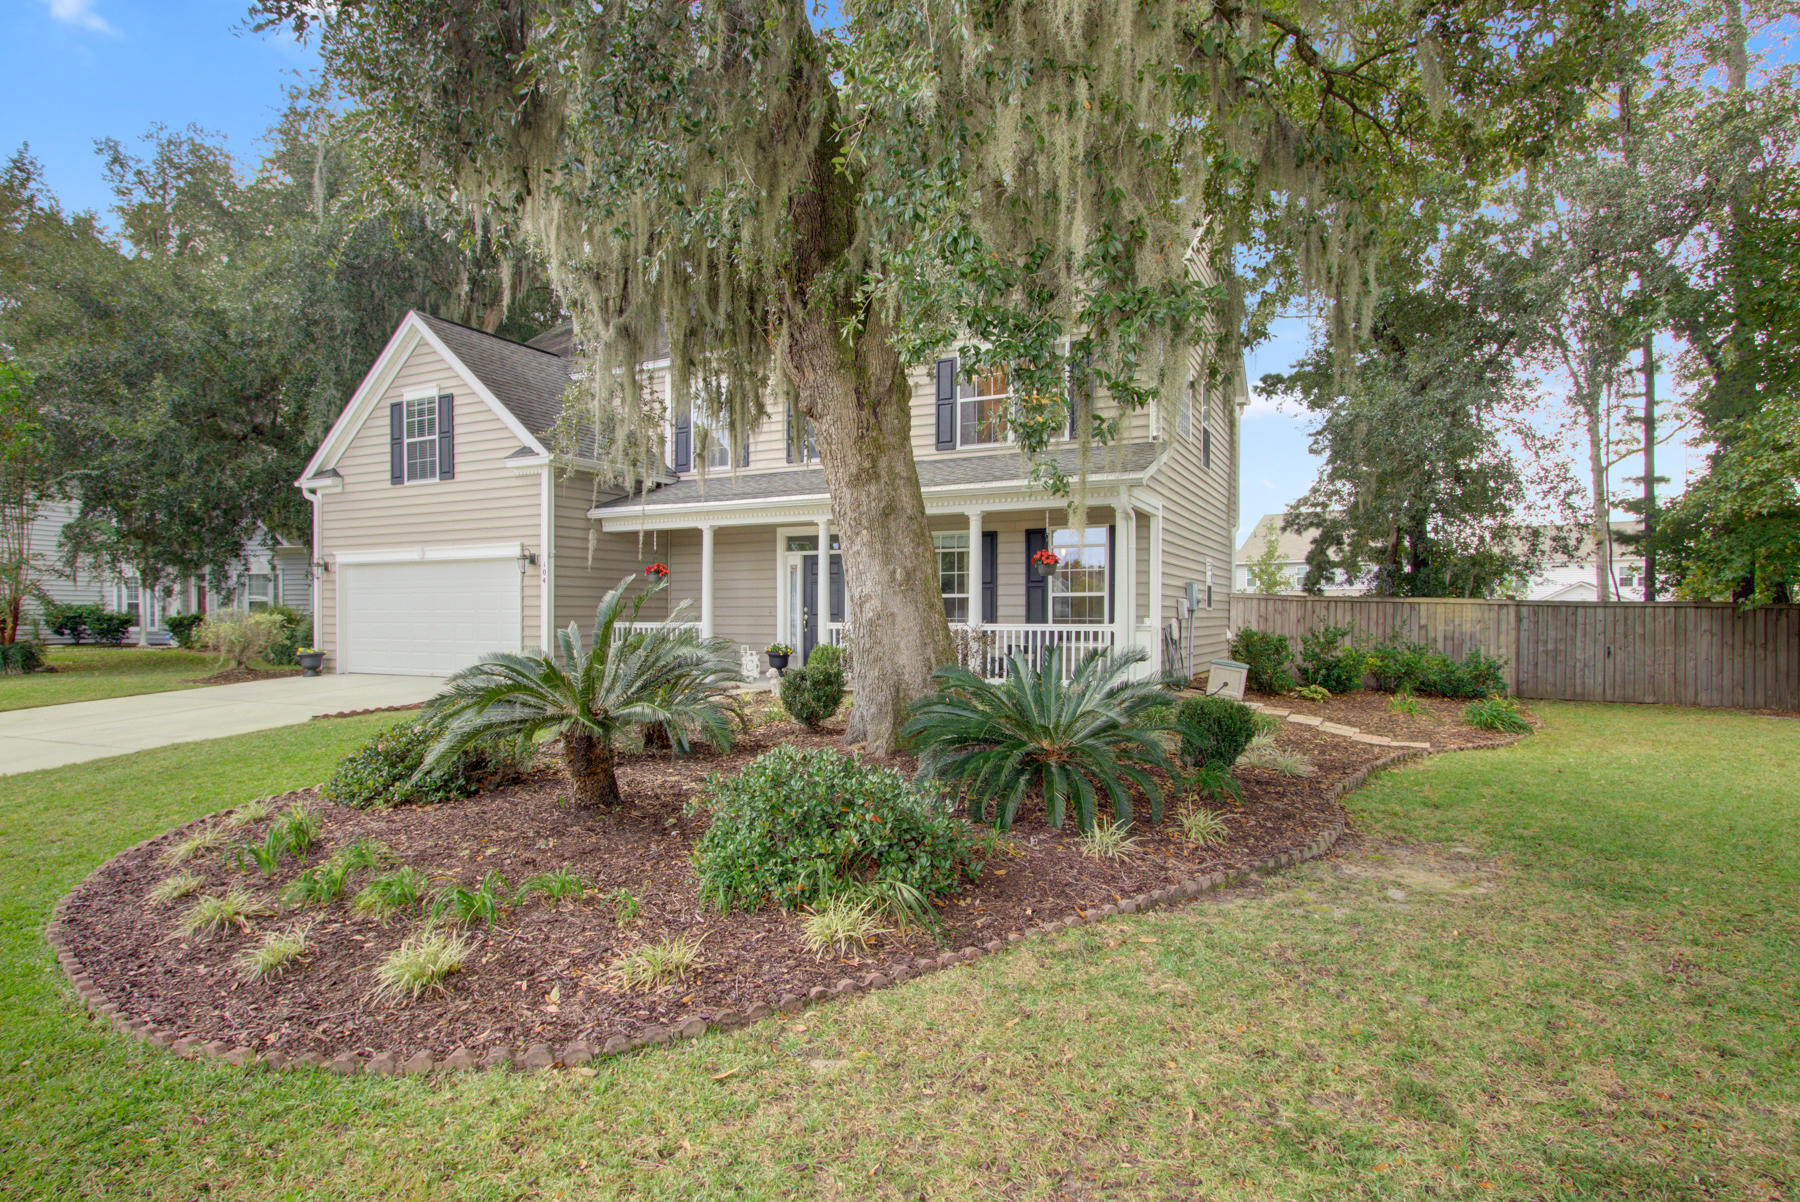 Legend Oaks Plantation Homes For Sale - 104 Sherry, Summerville, SC - 41